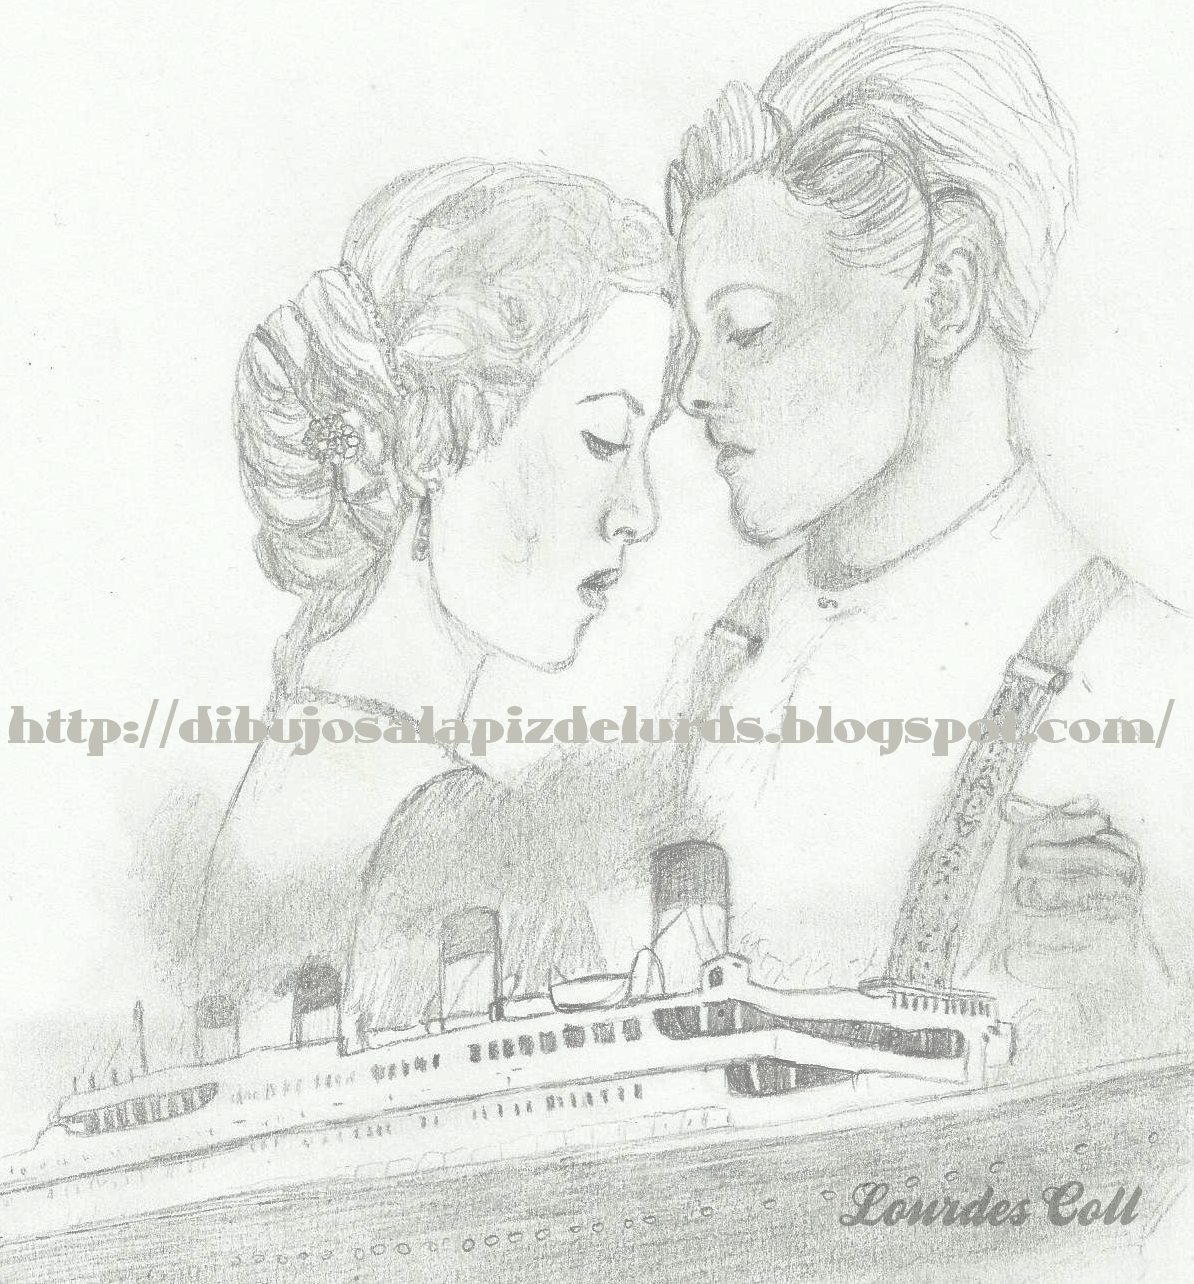 http://2.bp.blogspot.com/-2bfkUv_8fPA/T3sRNCprgoI/AAAAAAAABU8/14OHOgUR_ws/s1600/Titanic+3D+barco.jpg